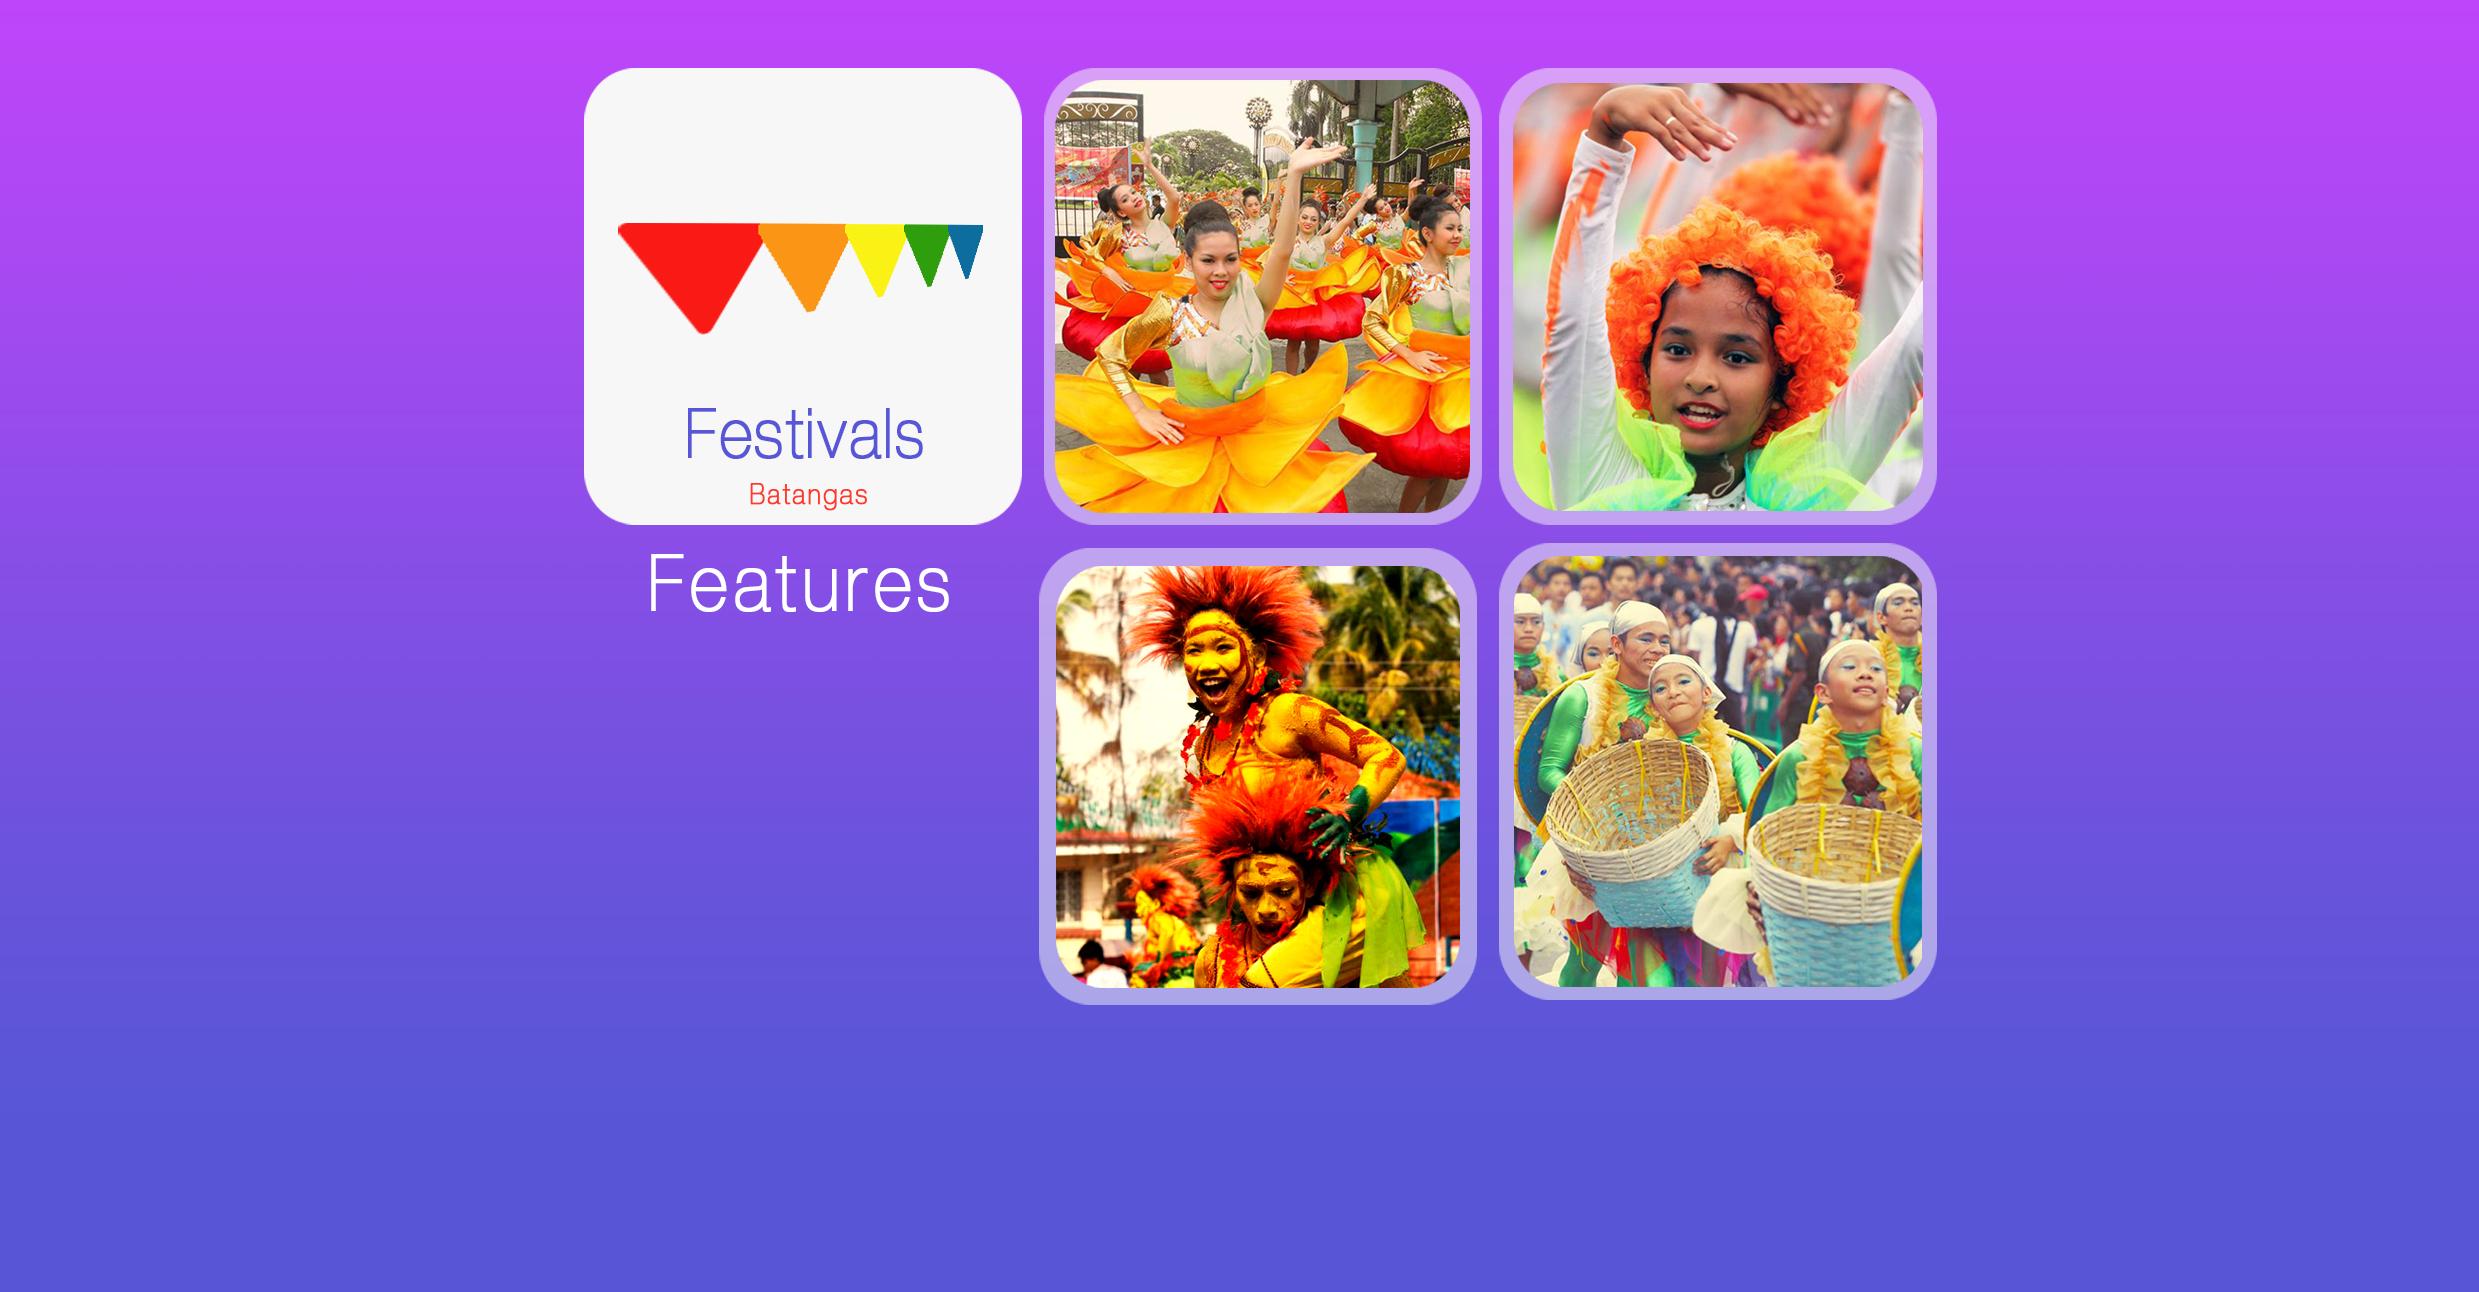 Batangas Festivals